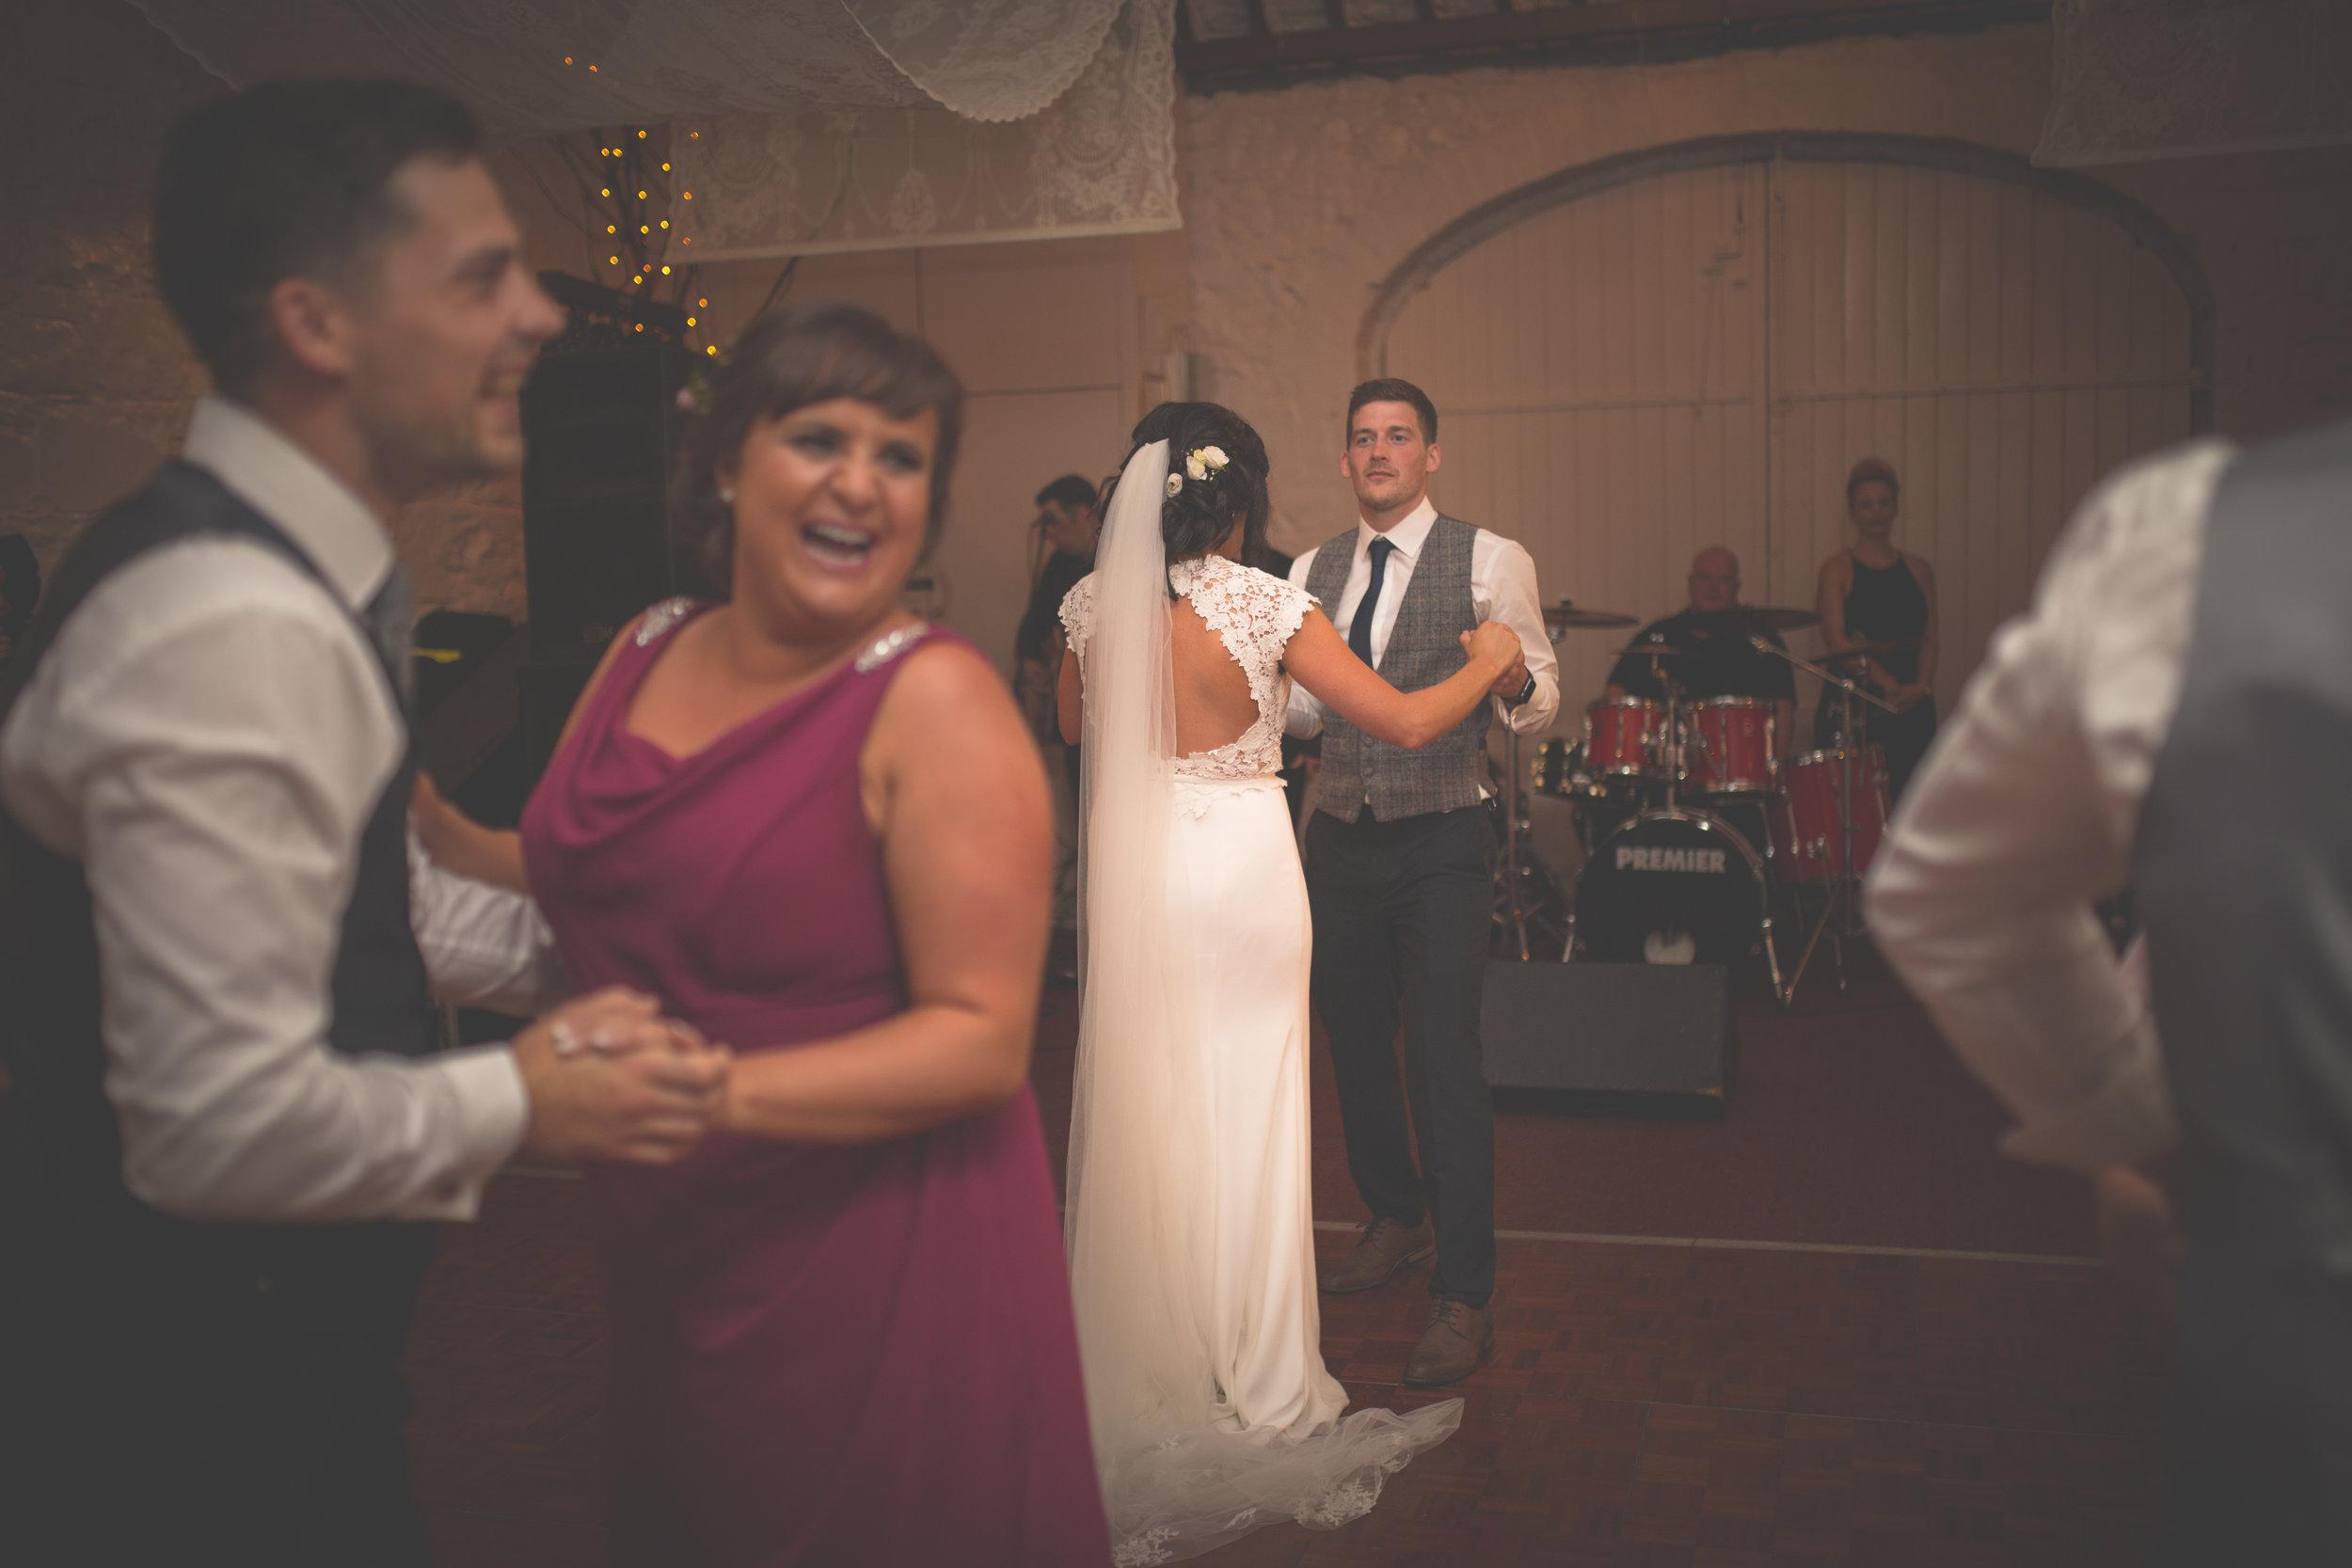 Brian McEwan Wedding Photography | Carol-Annee & Sean | The Dancing-41.jpg